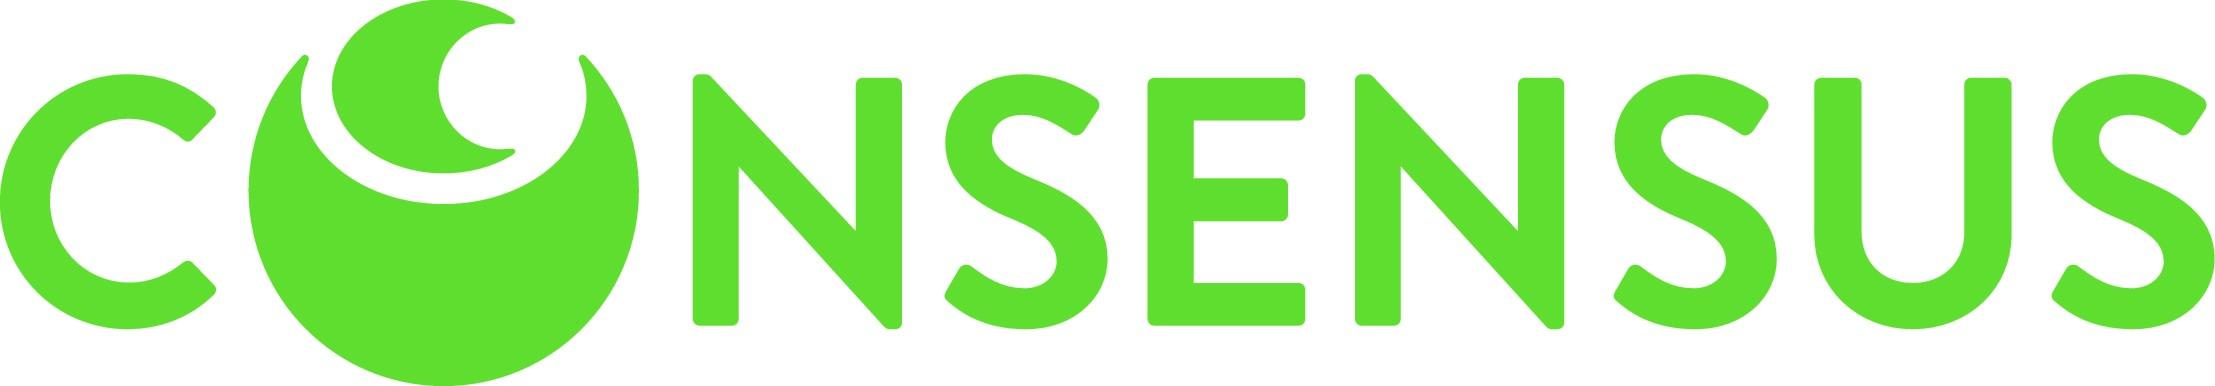 Consensus_logo.eps.jpg